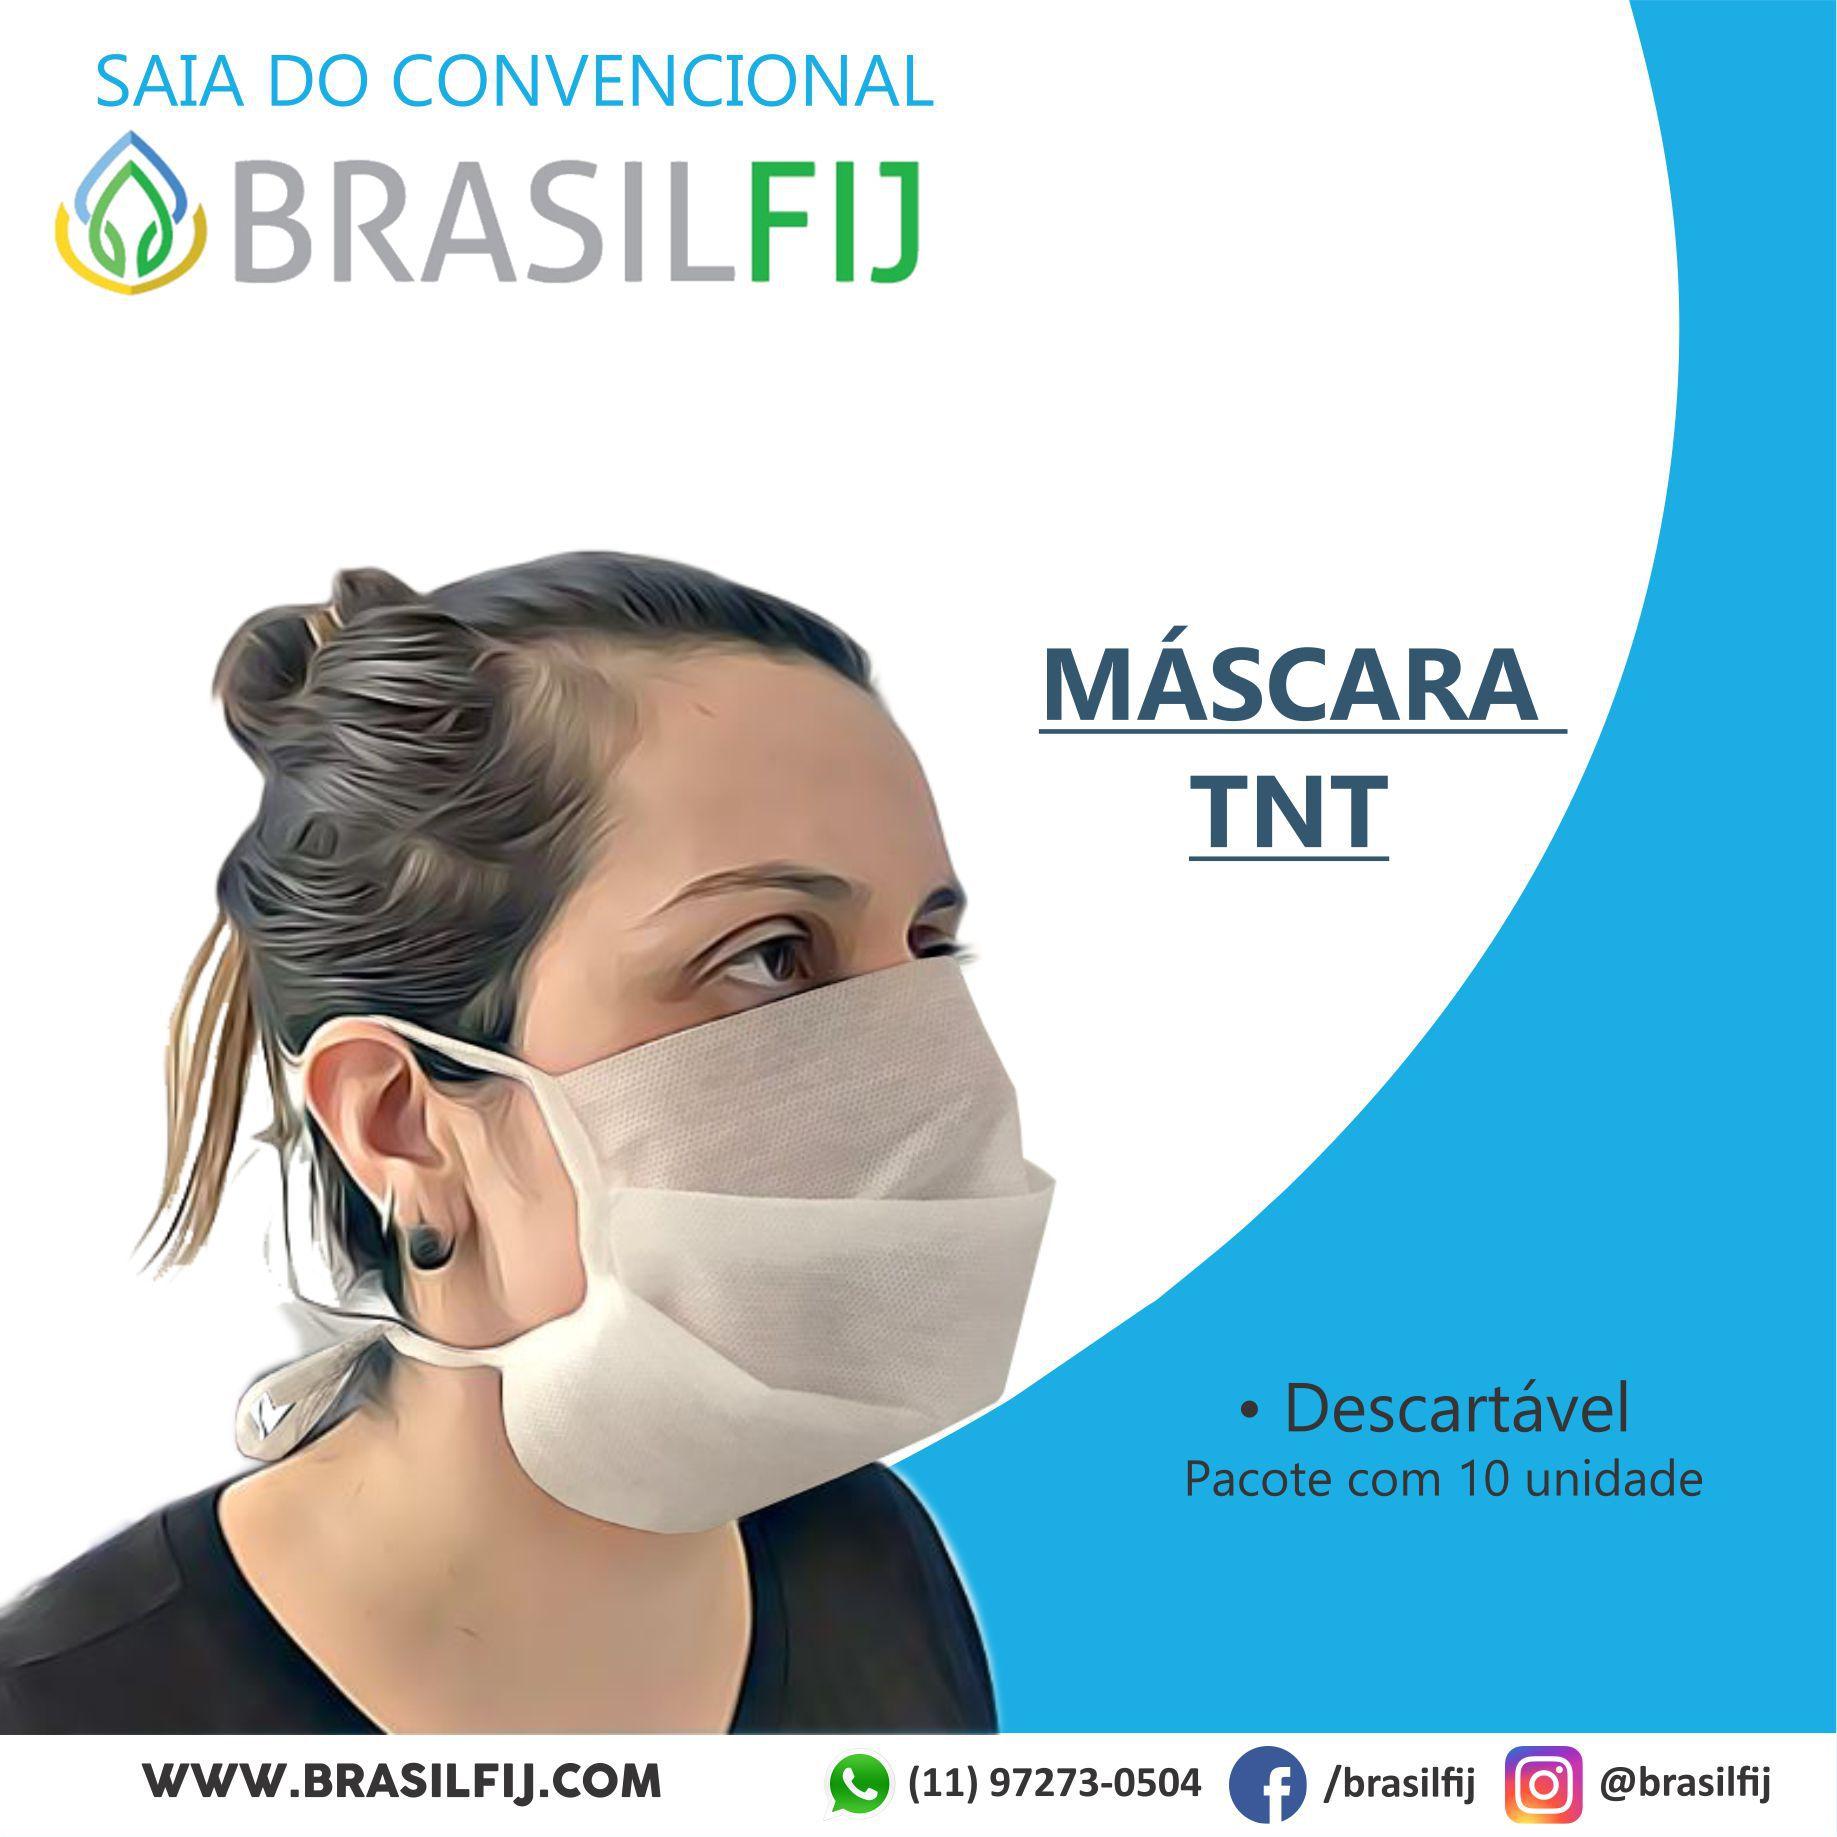 MÁSCARA FACIAL TNT - PACOTE COM 10 UNIDADES - BRASILFIJ